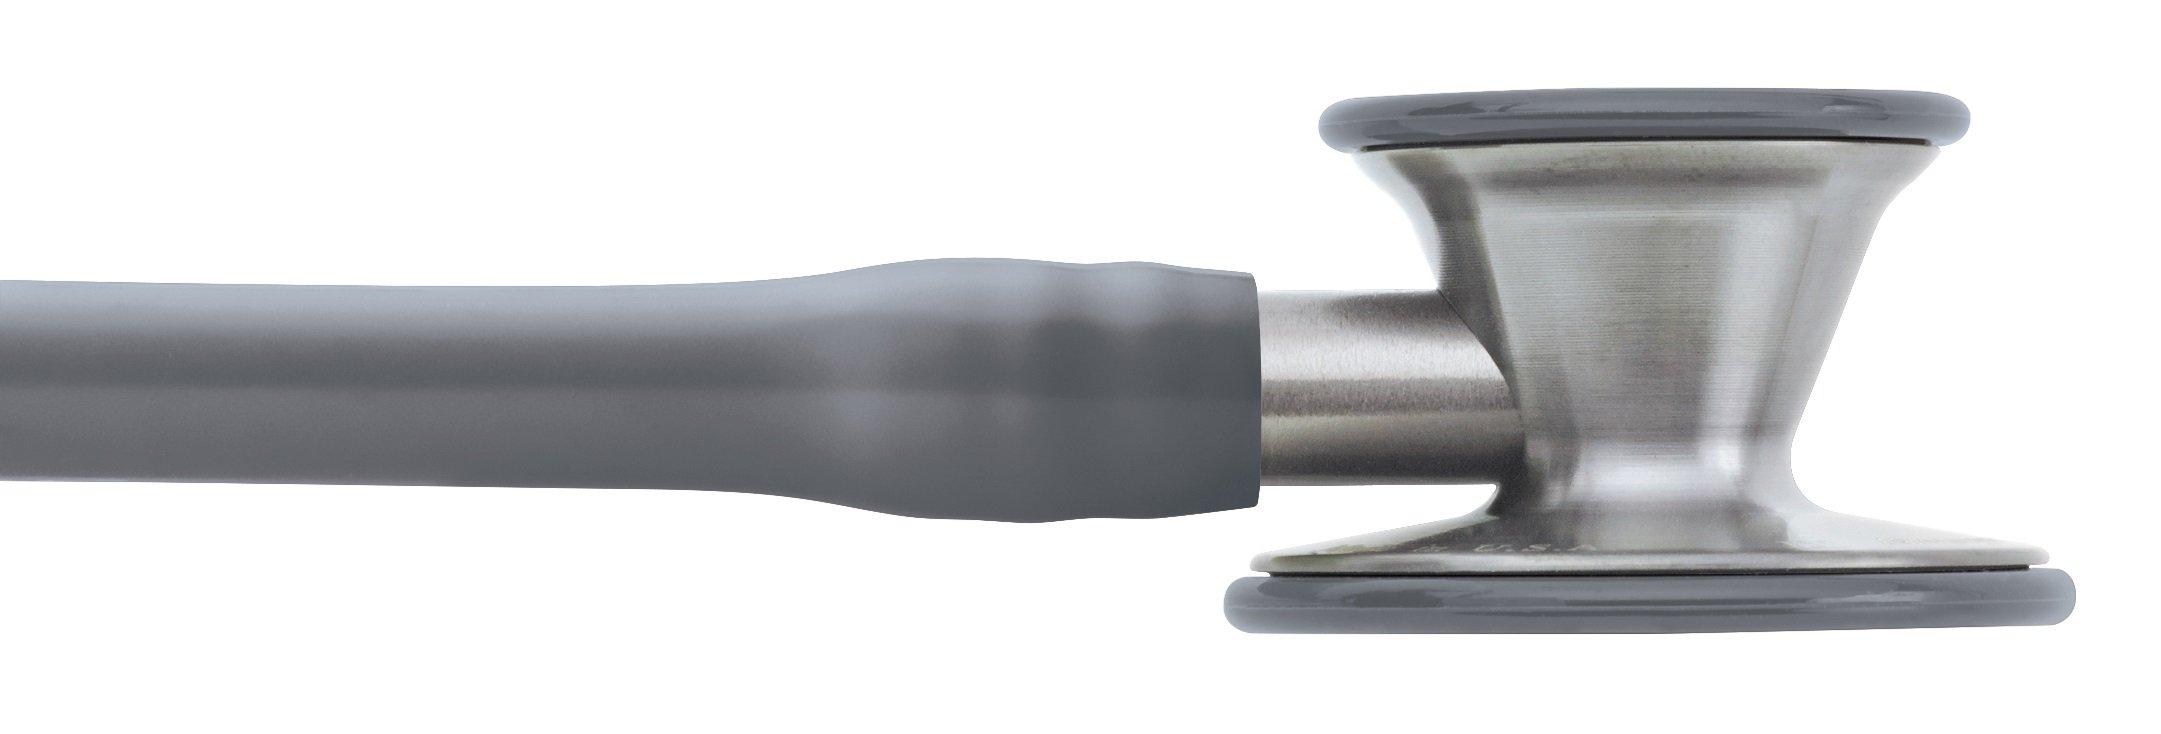 3M Littmann Cardiology III Stethoscope, Grey Tube, 27 inch, 3136